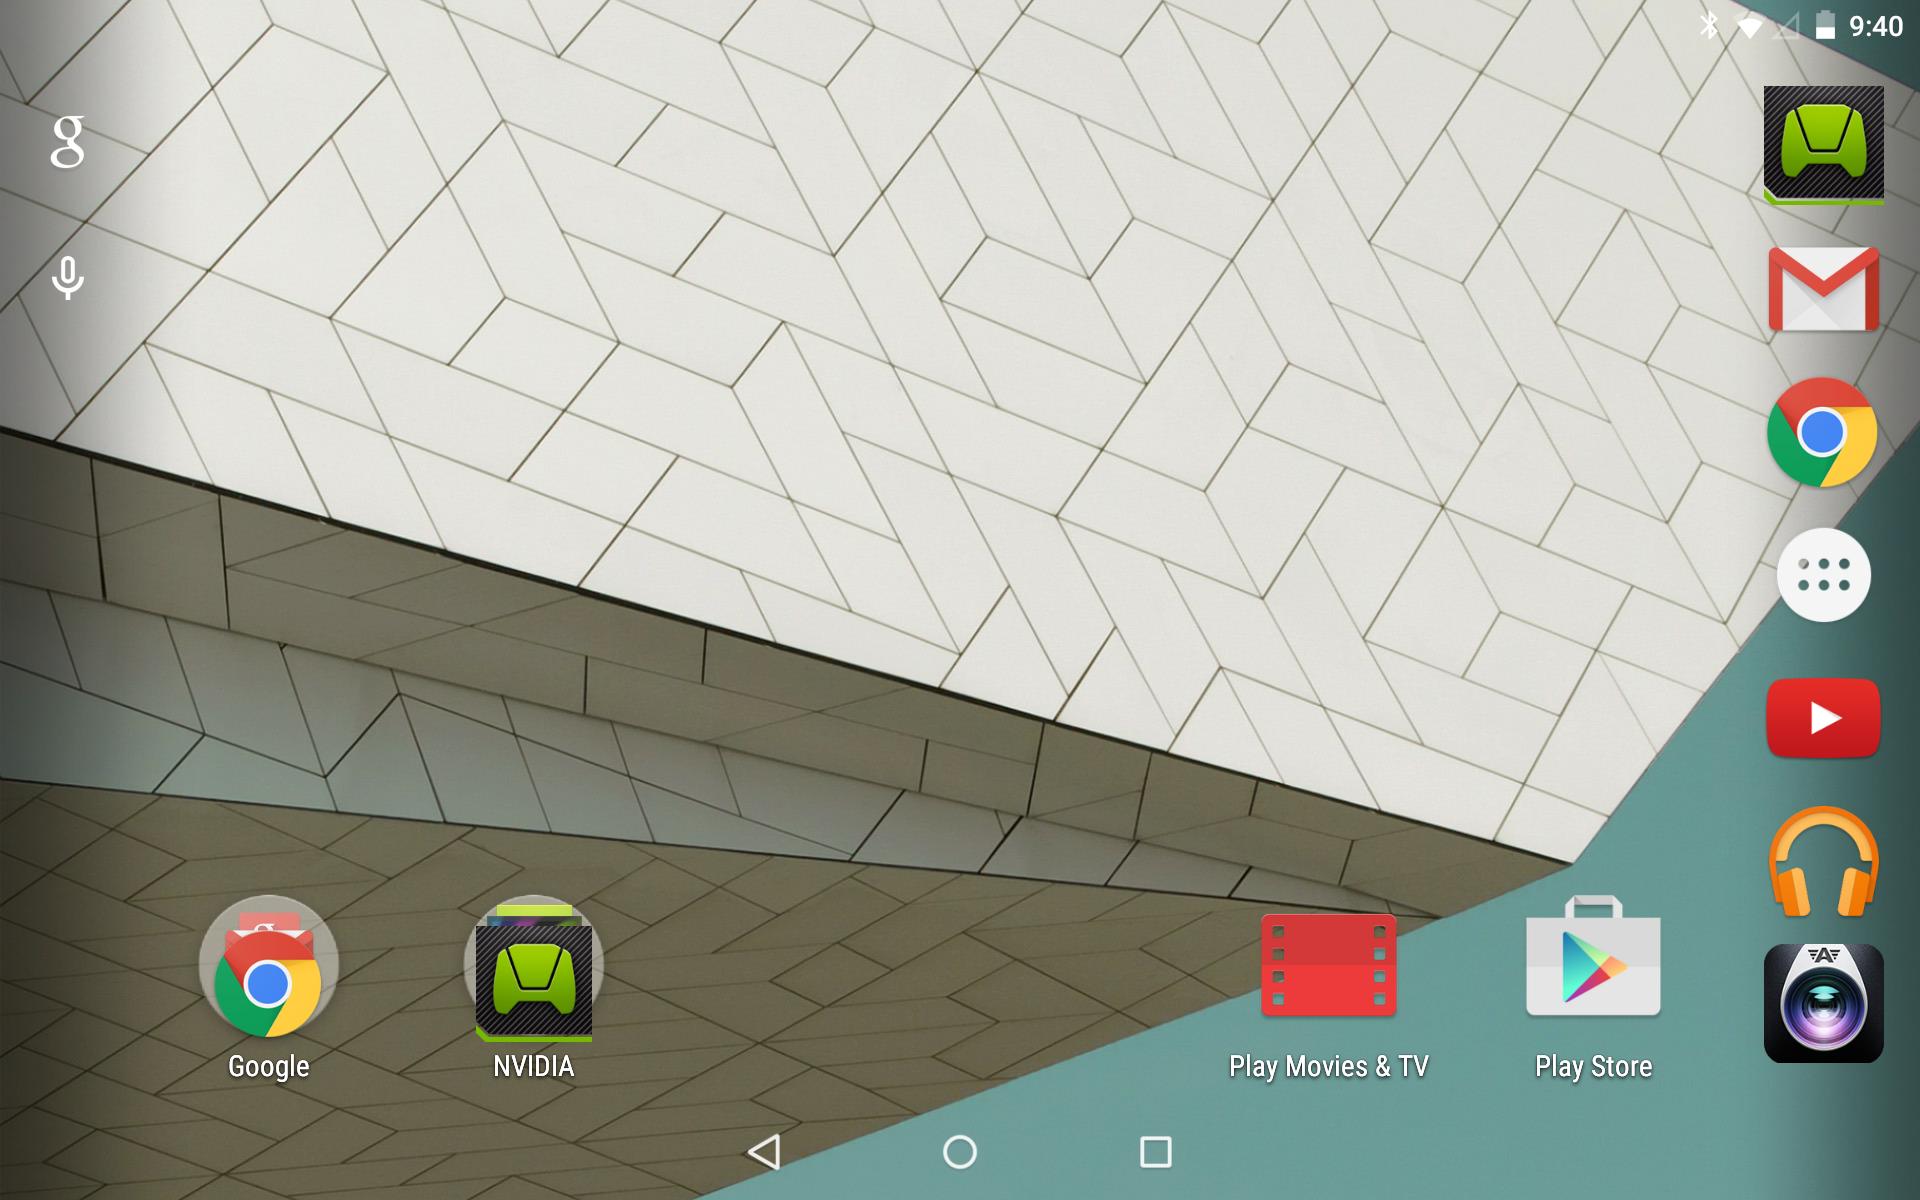 Screenshot_2014-11-18-09-40-54